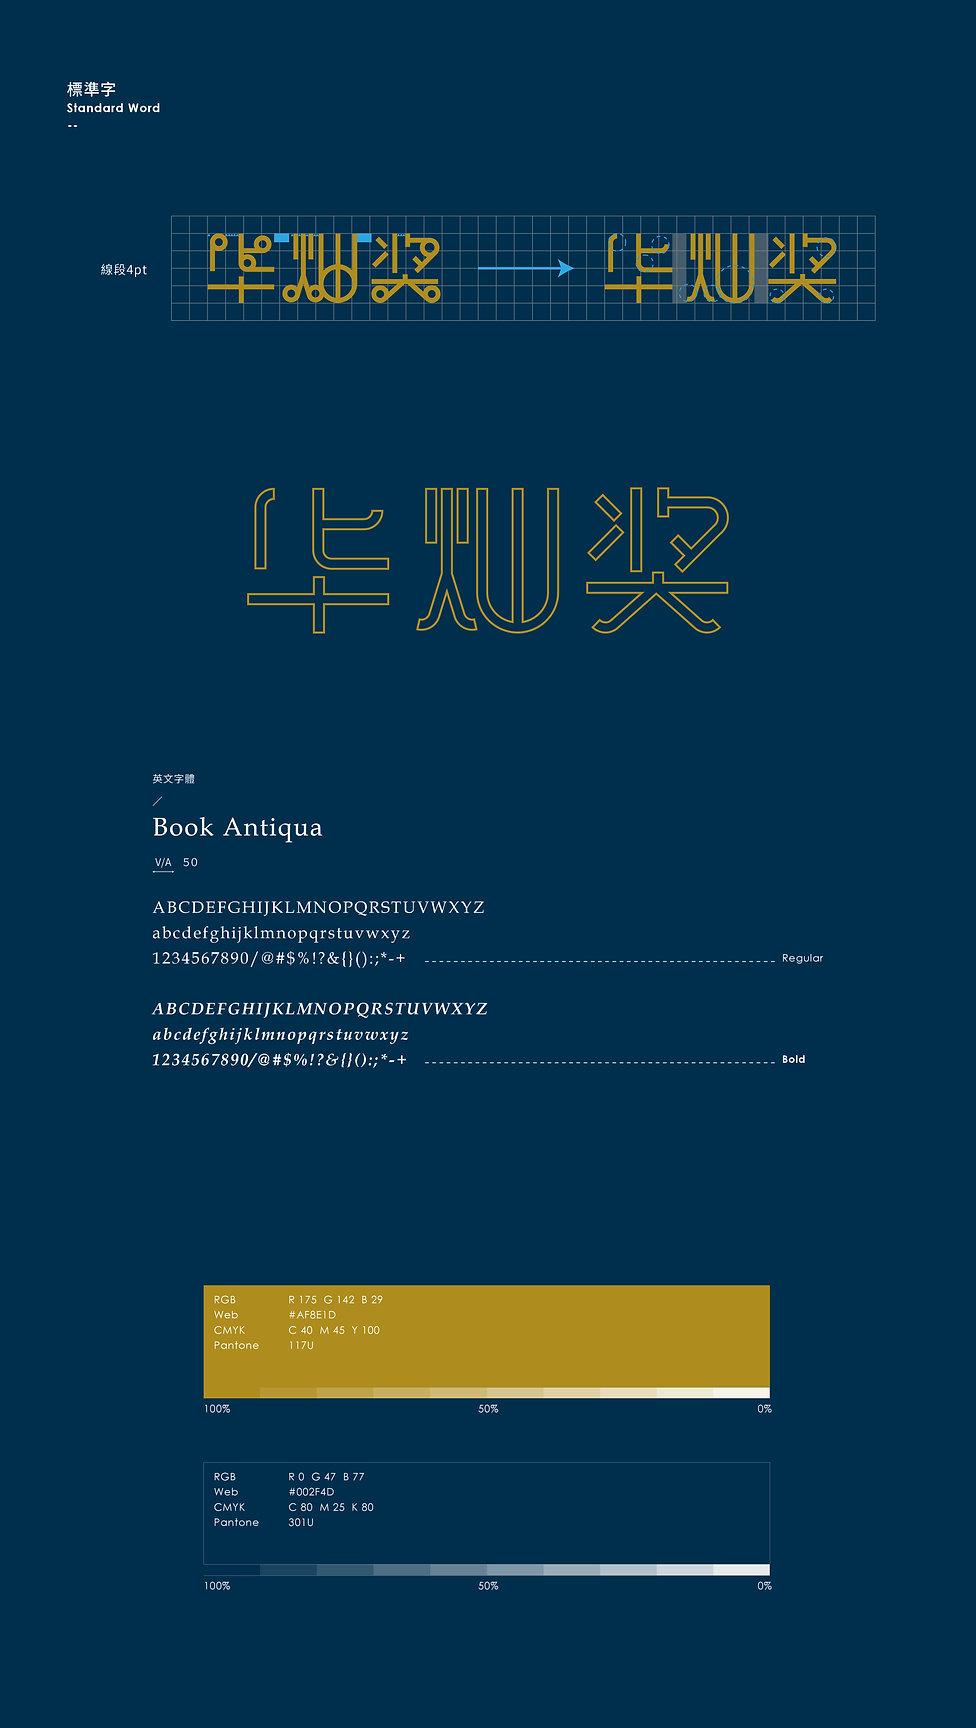 華燦獎_behance-02.jpg